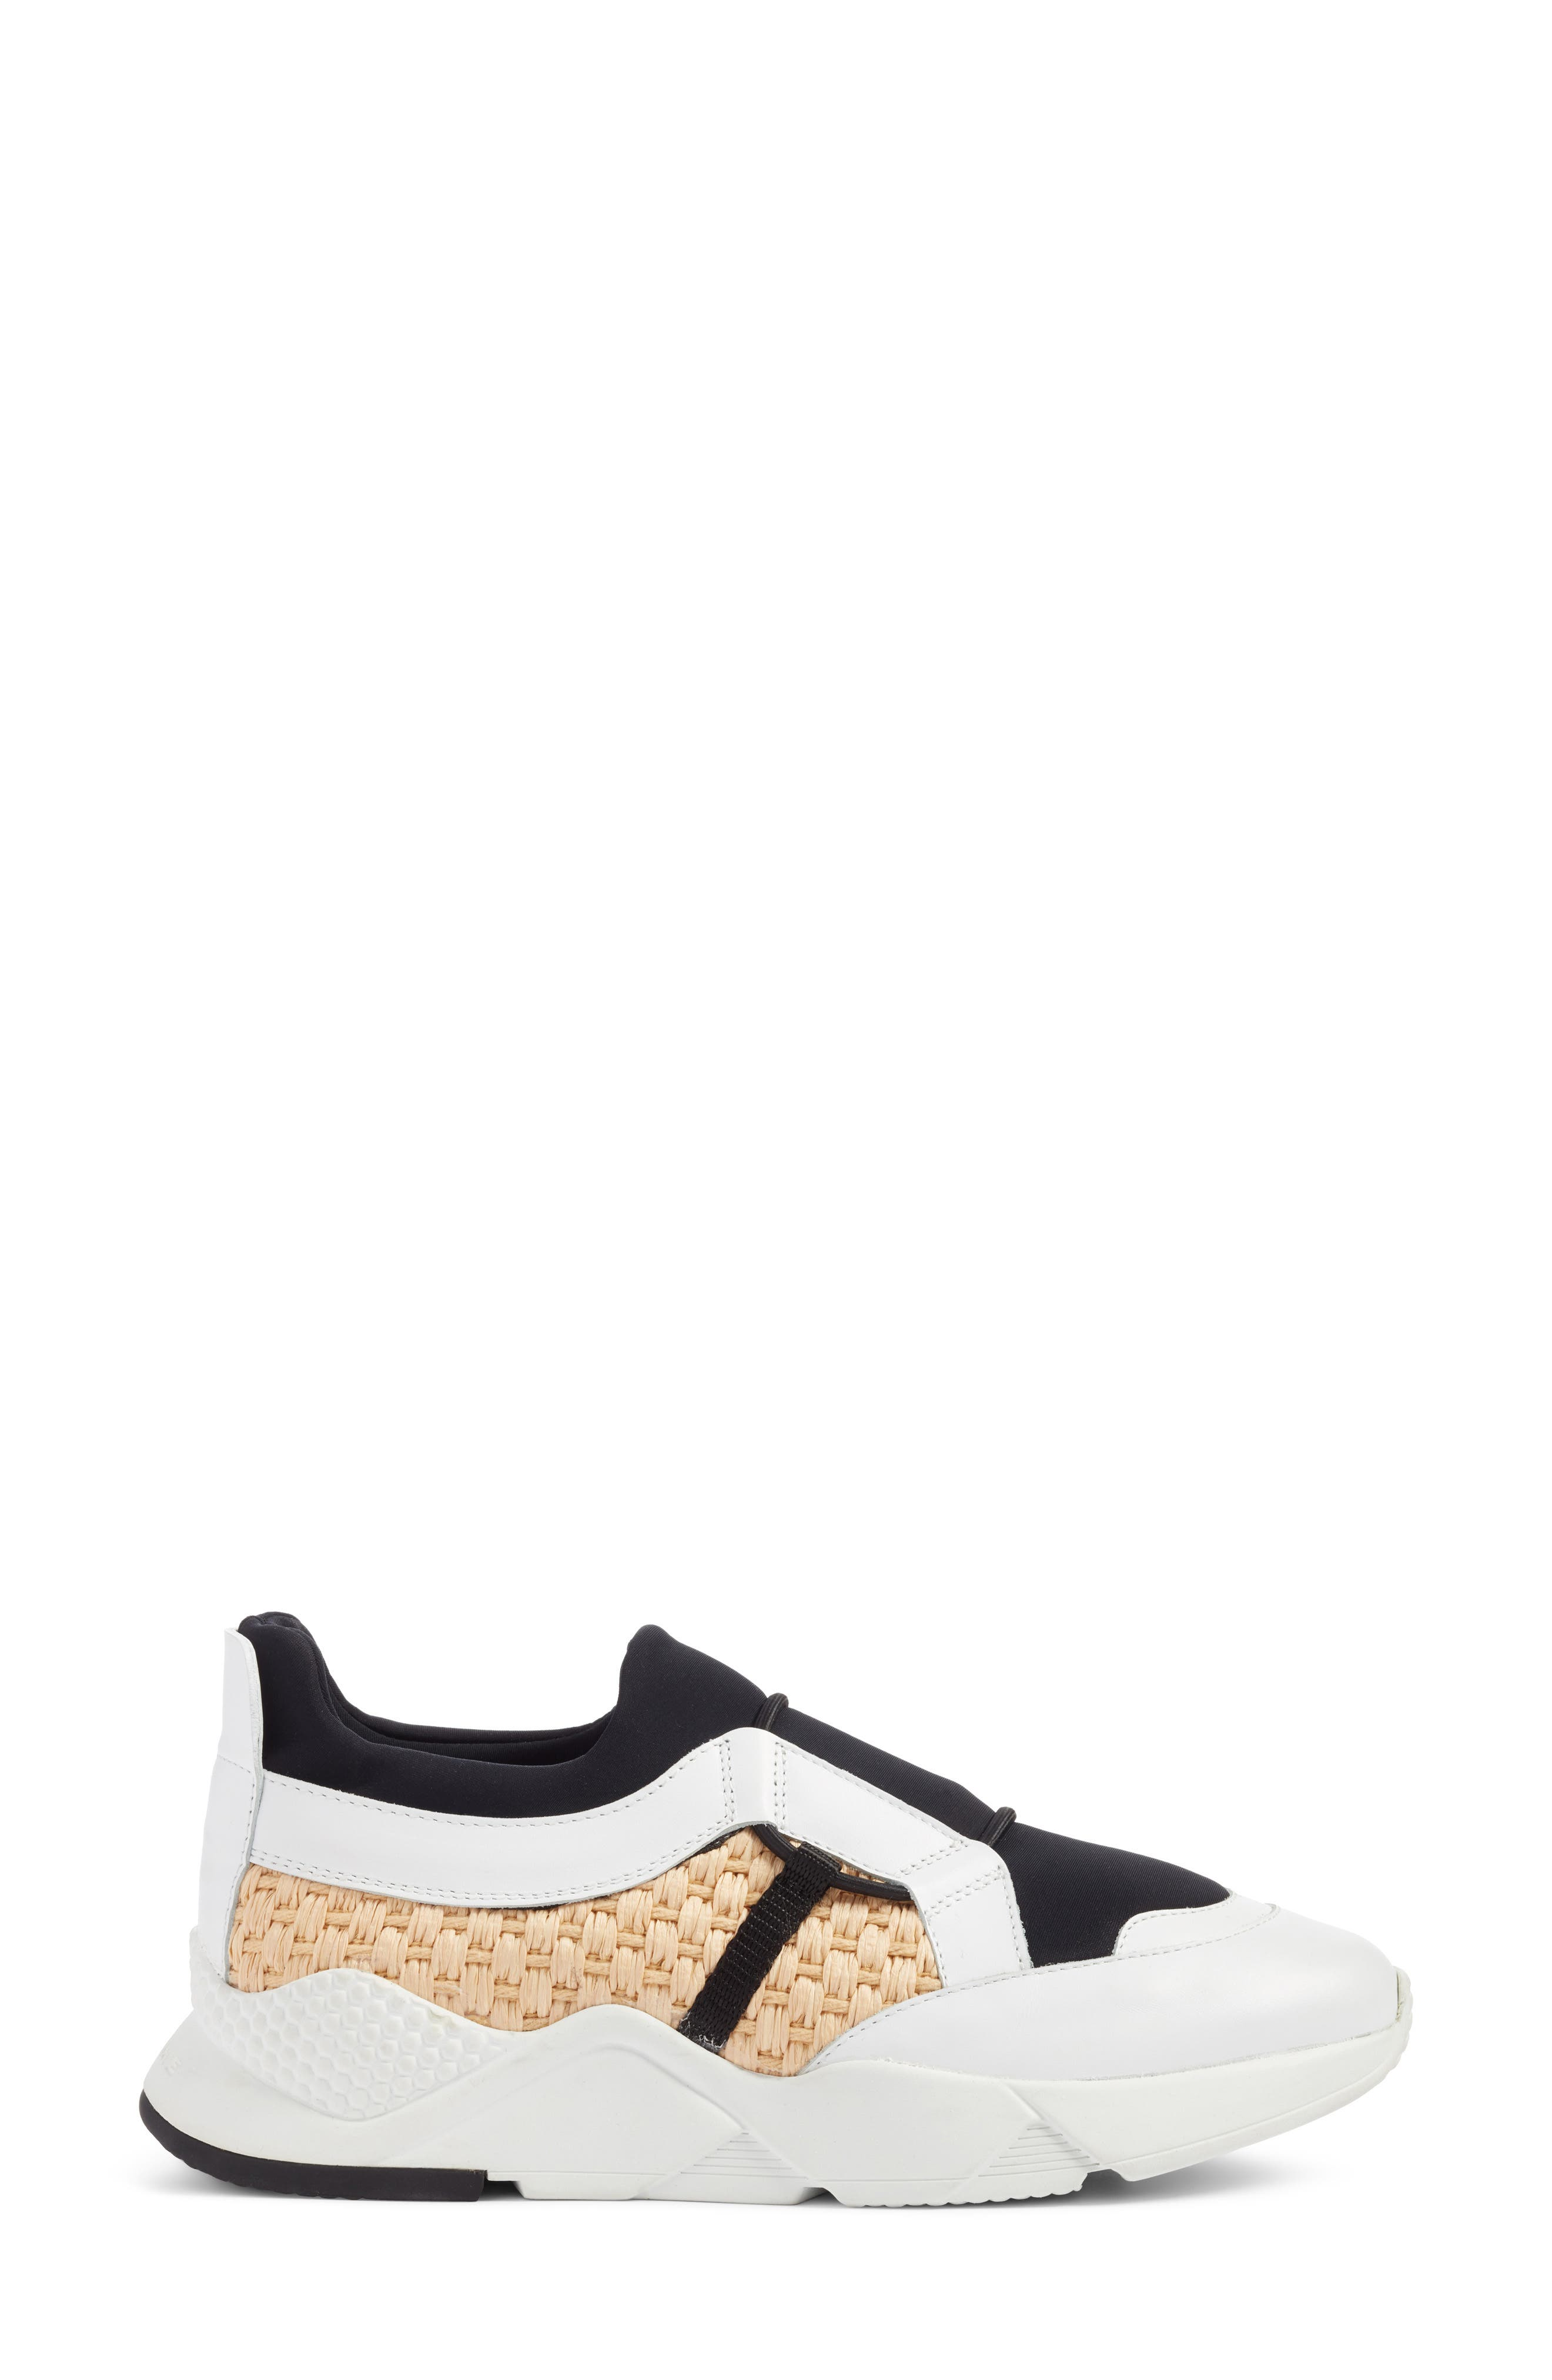 Salvy Woven Sneaker,                             Alternate thumbnail 3, color,                             100